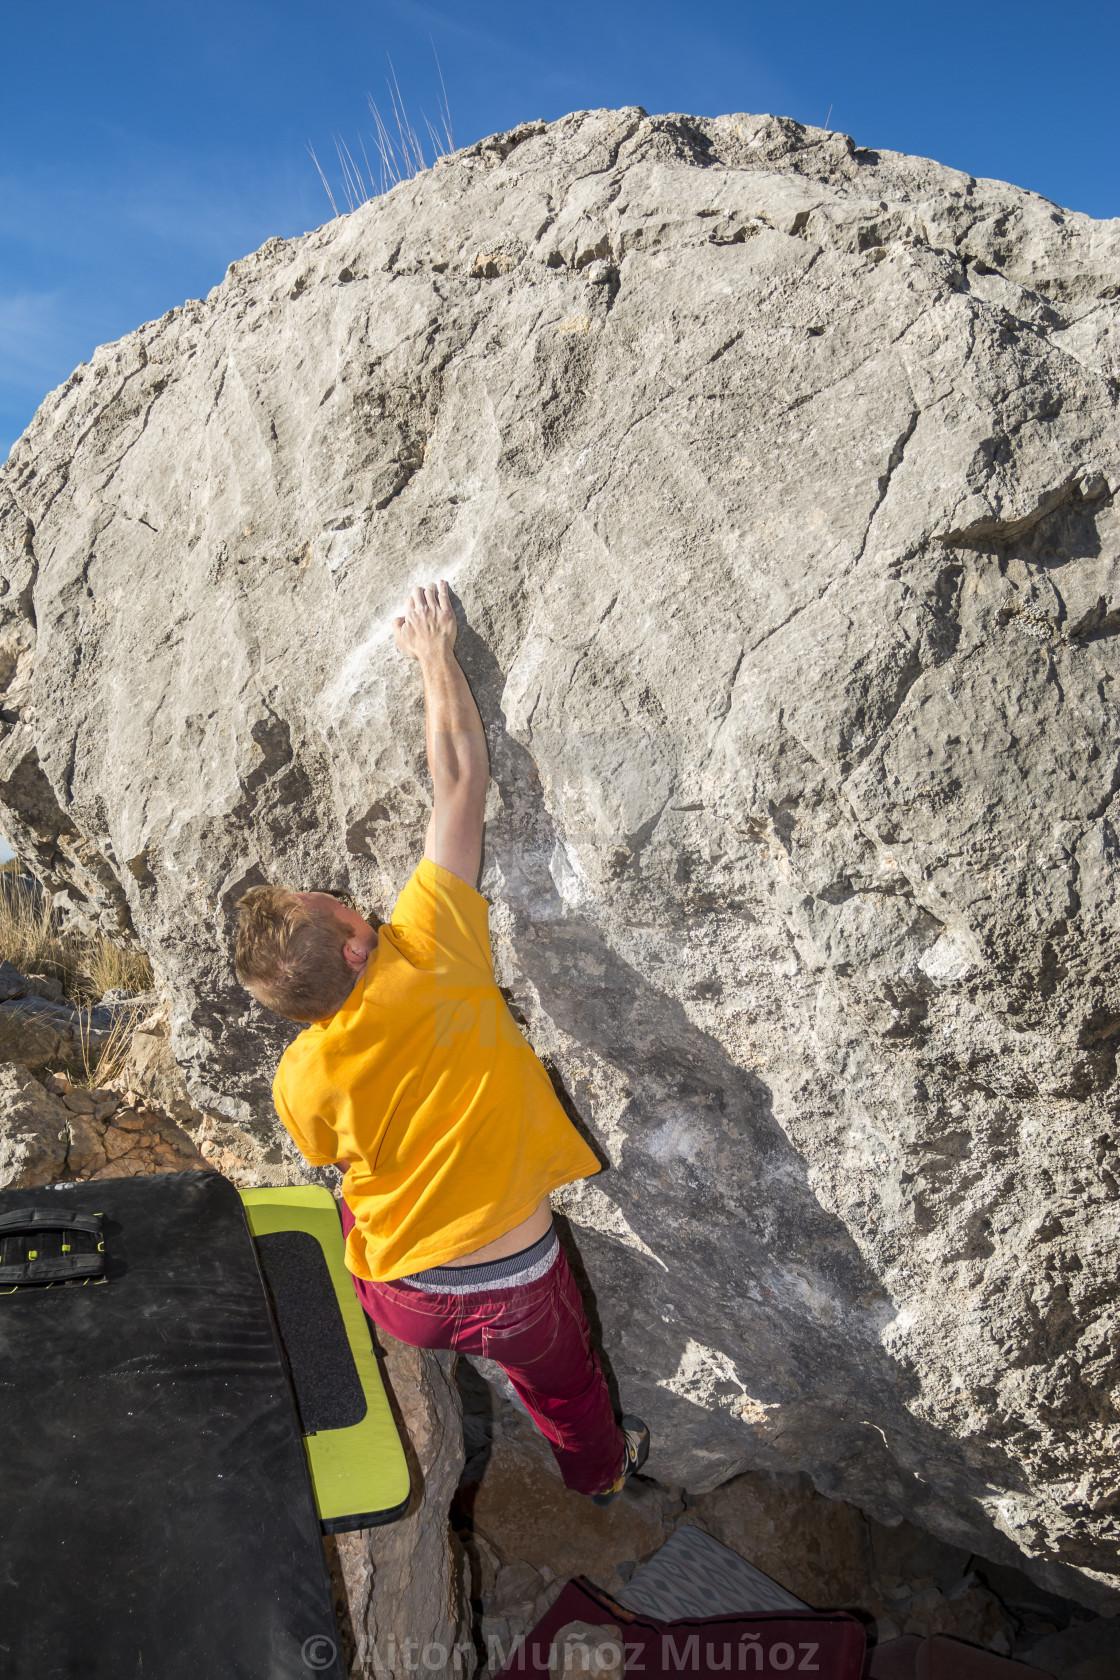 """Back view of man climbing rock bouldering"" stock image"